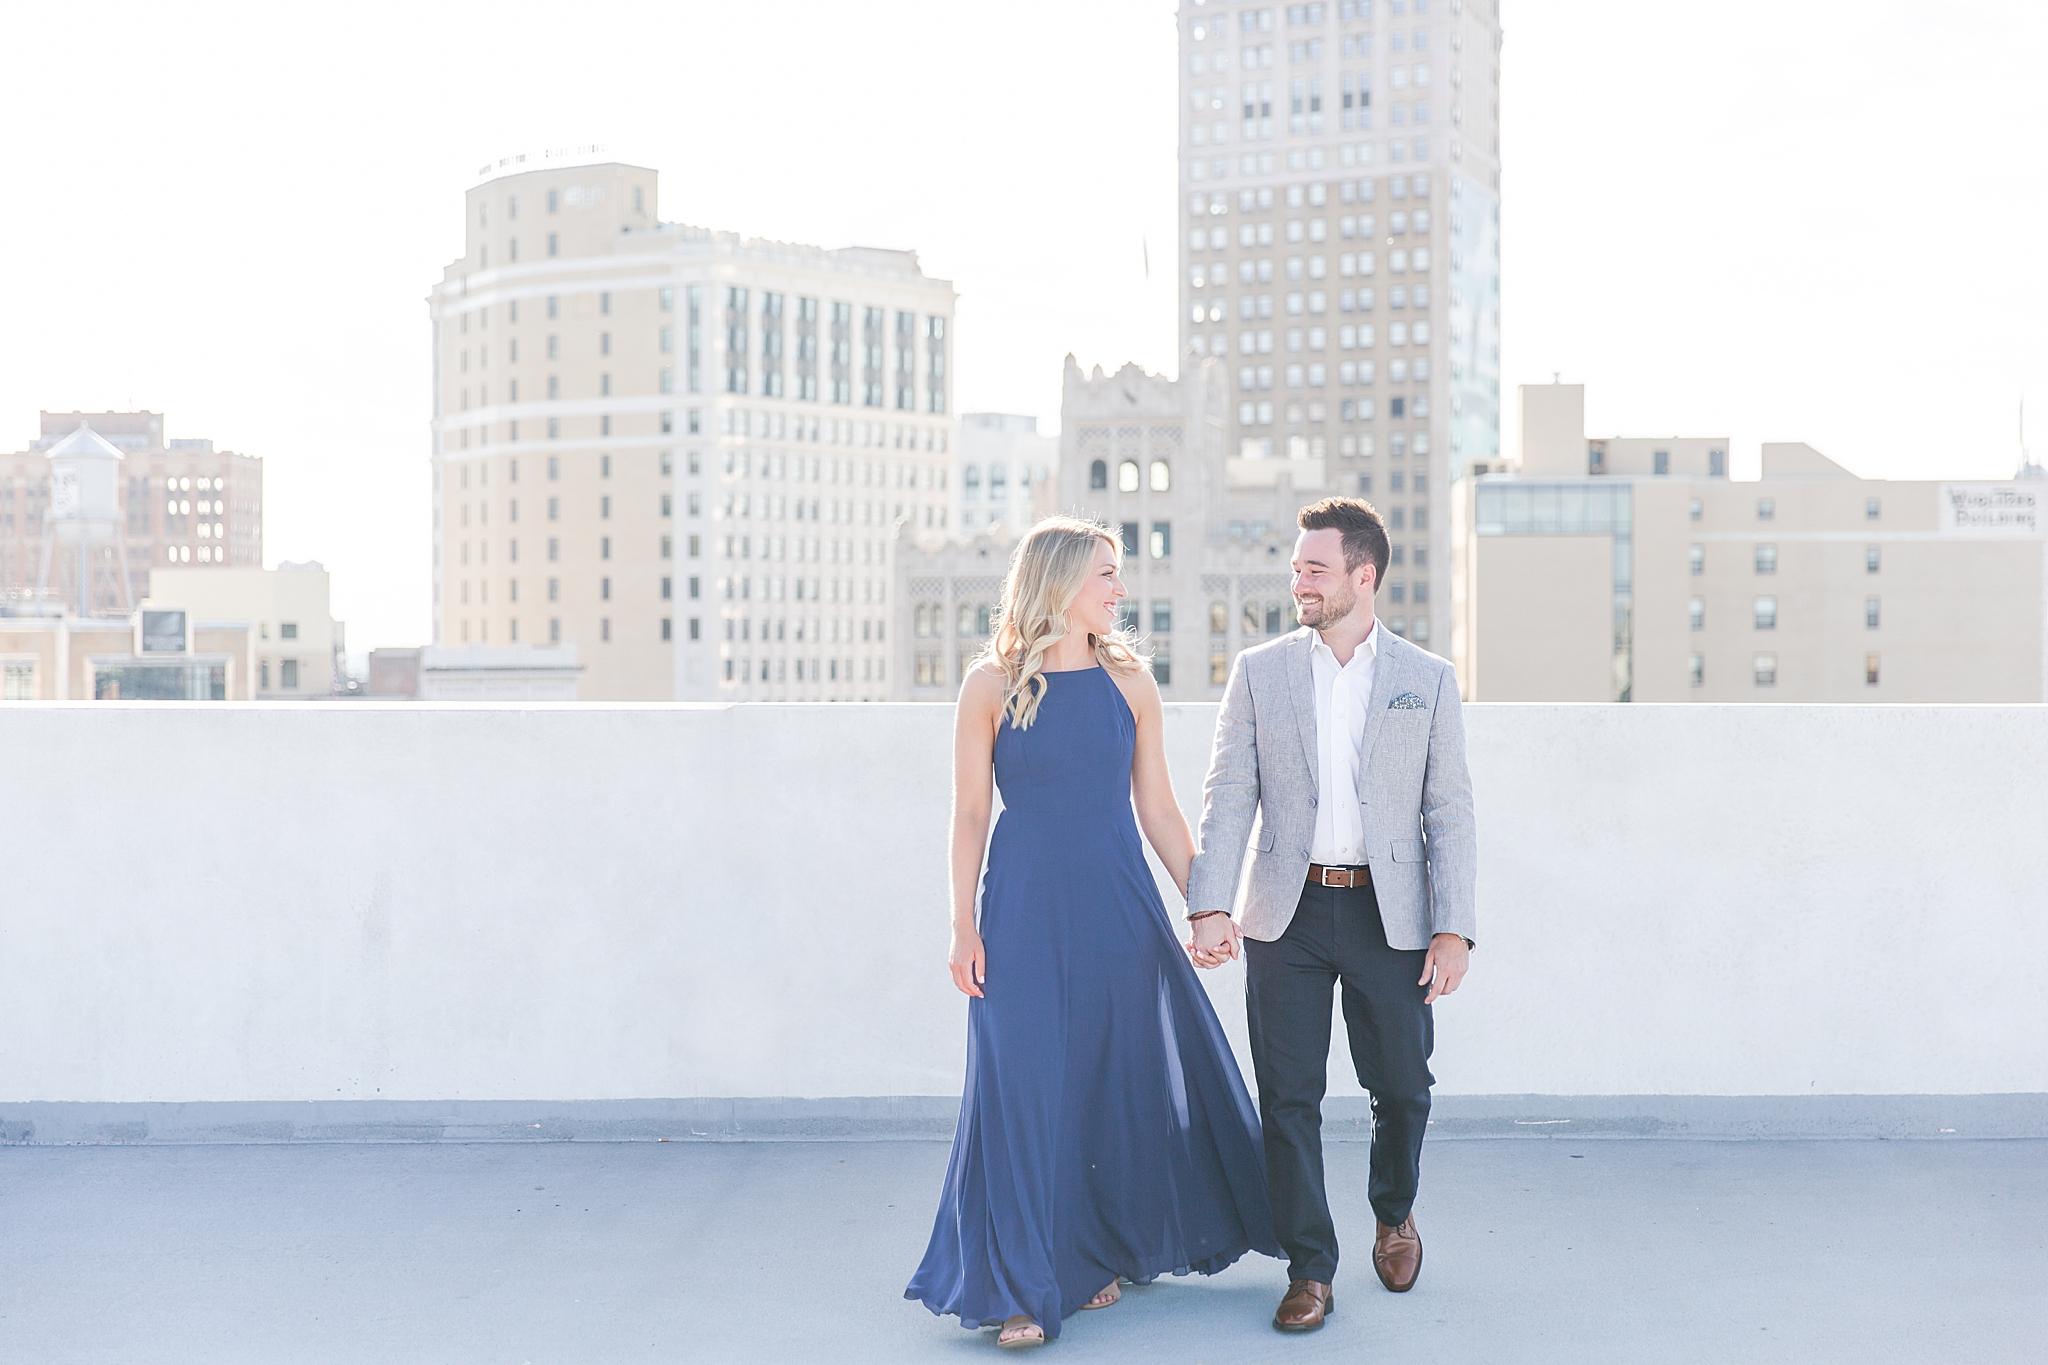 detroit-wedding-photographer-downtown-detroit-belle-isle-engagement-photos-sarah-eric-by-courtney-carolyn-photography_0016.jpg